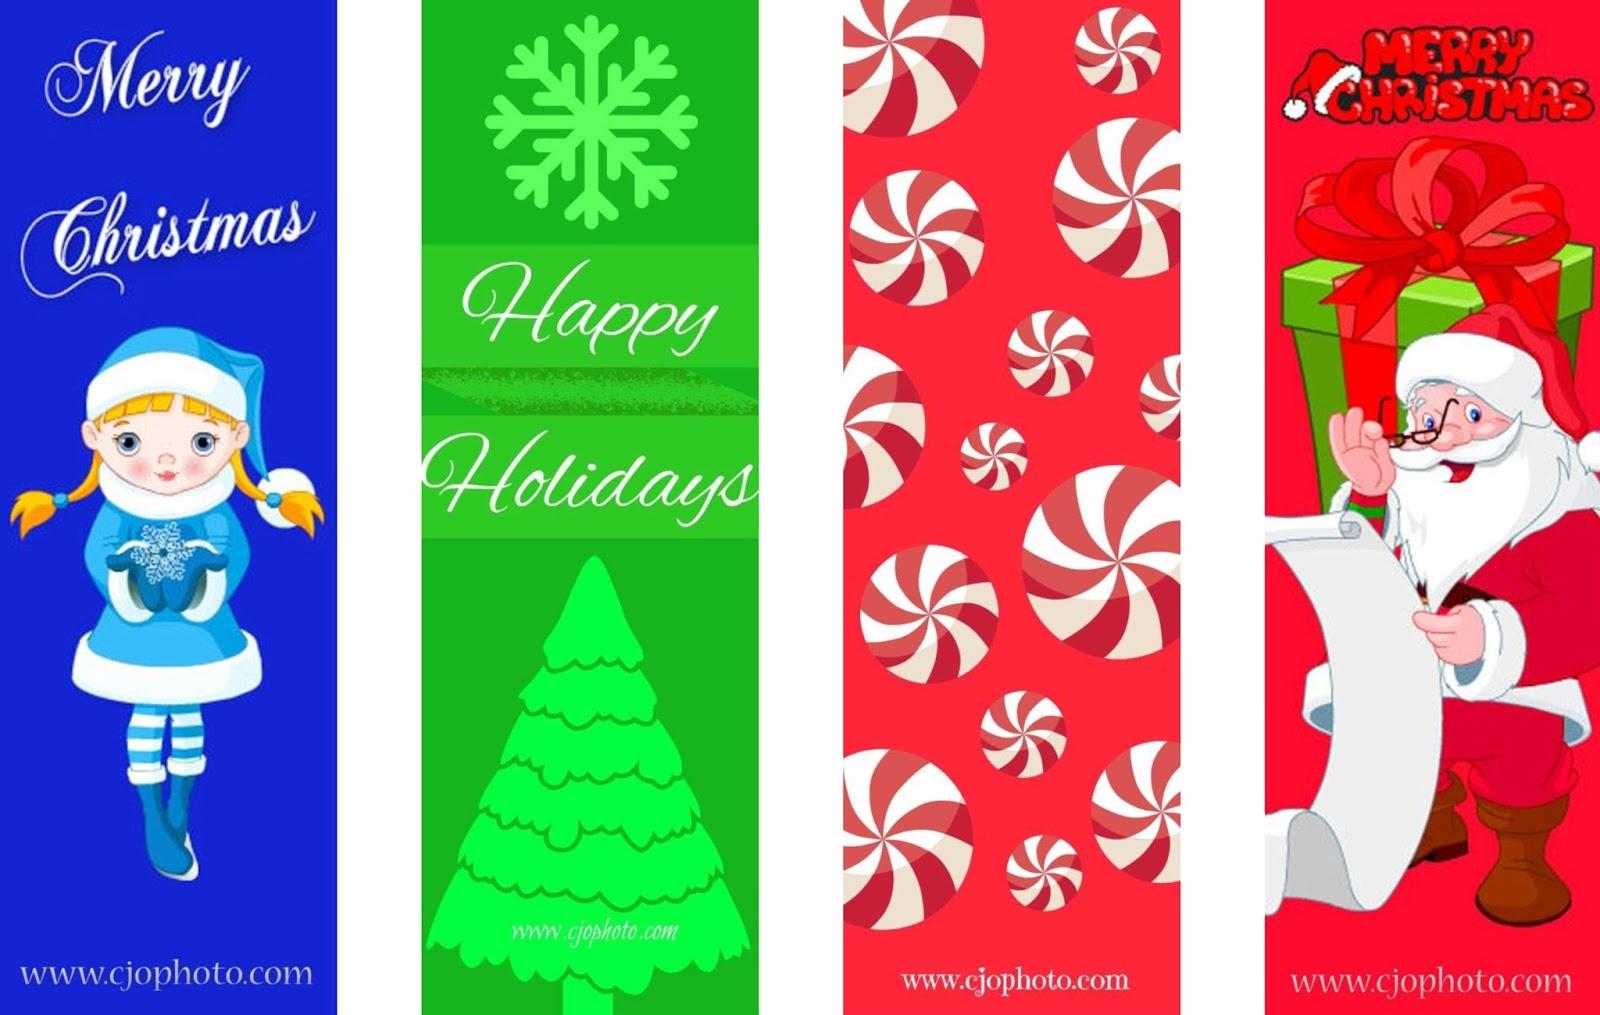 Cjo Photo: Printable Bookmarks: Christmas - Free Printable Bookmarks For Christmas